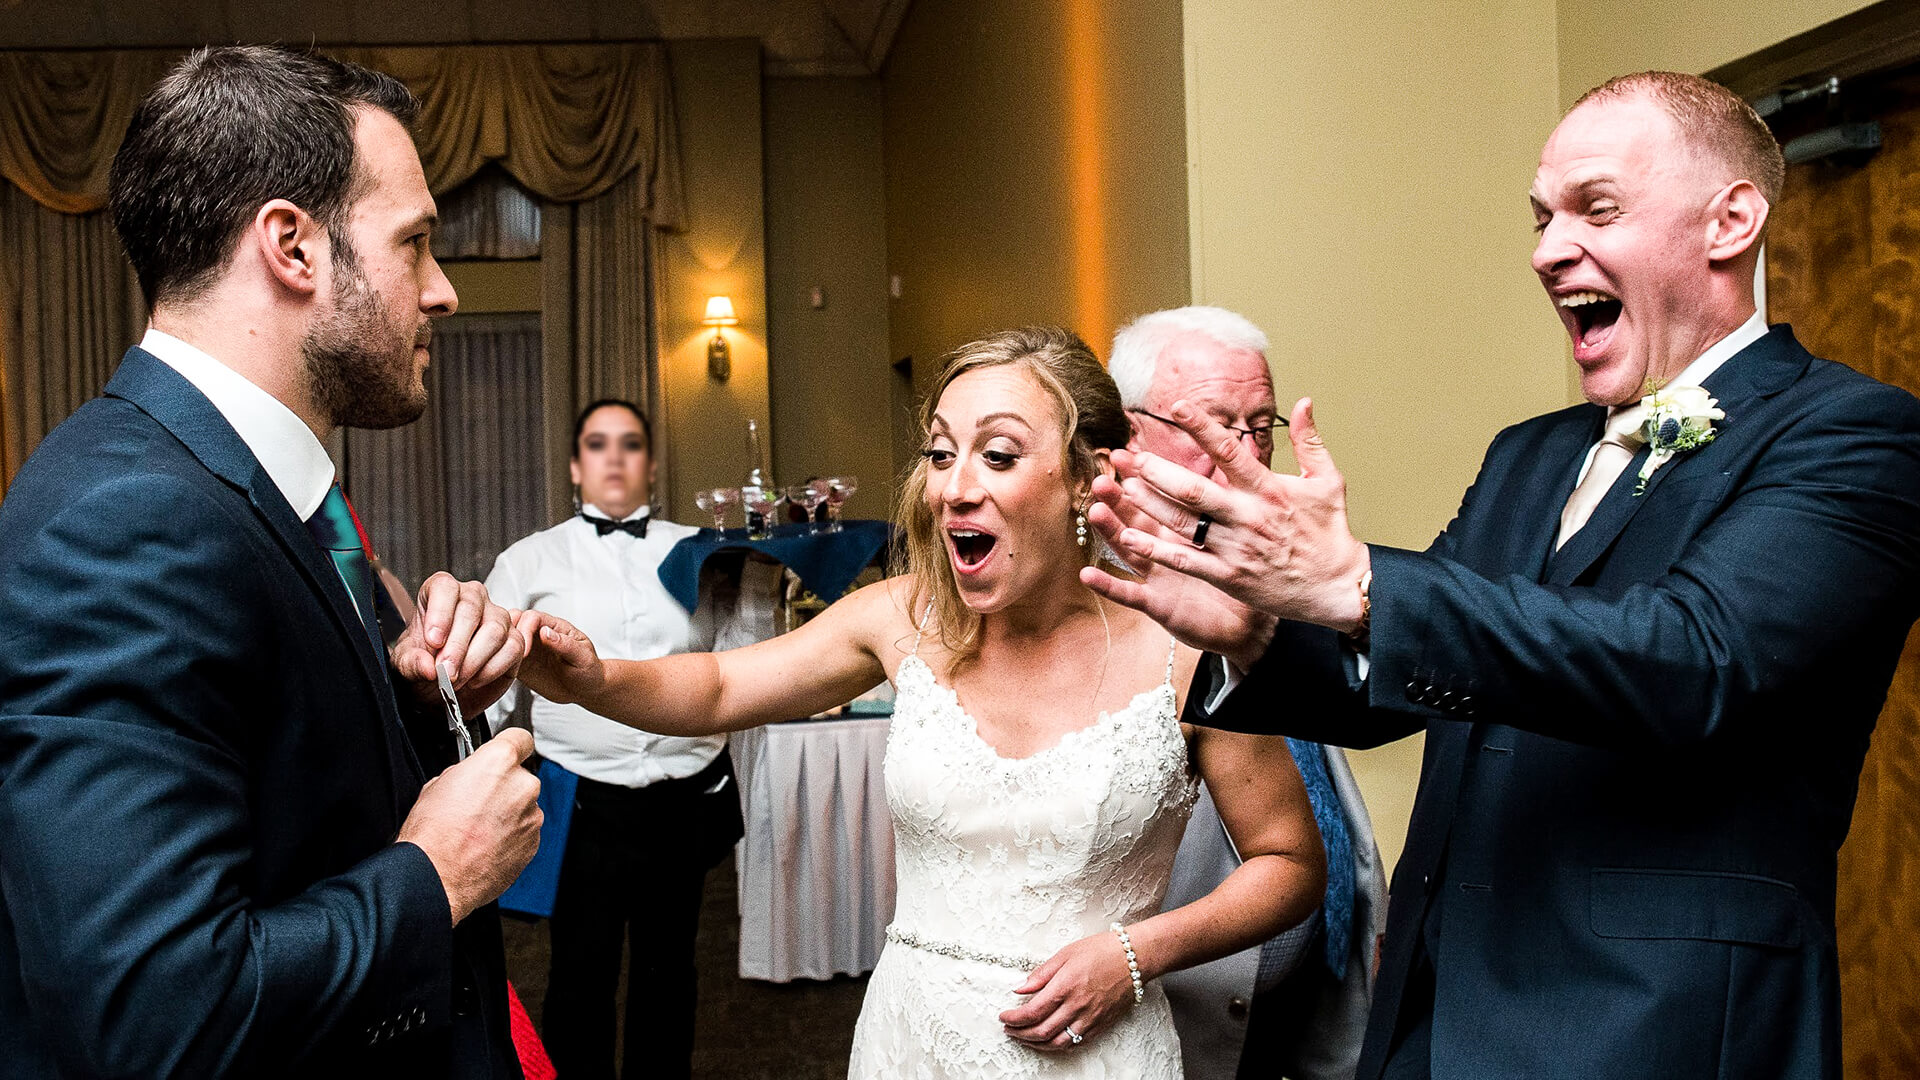 Manchester wedding magician aaron calvert blowing bride and grrom away at manchester wedding